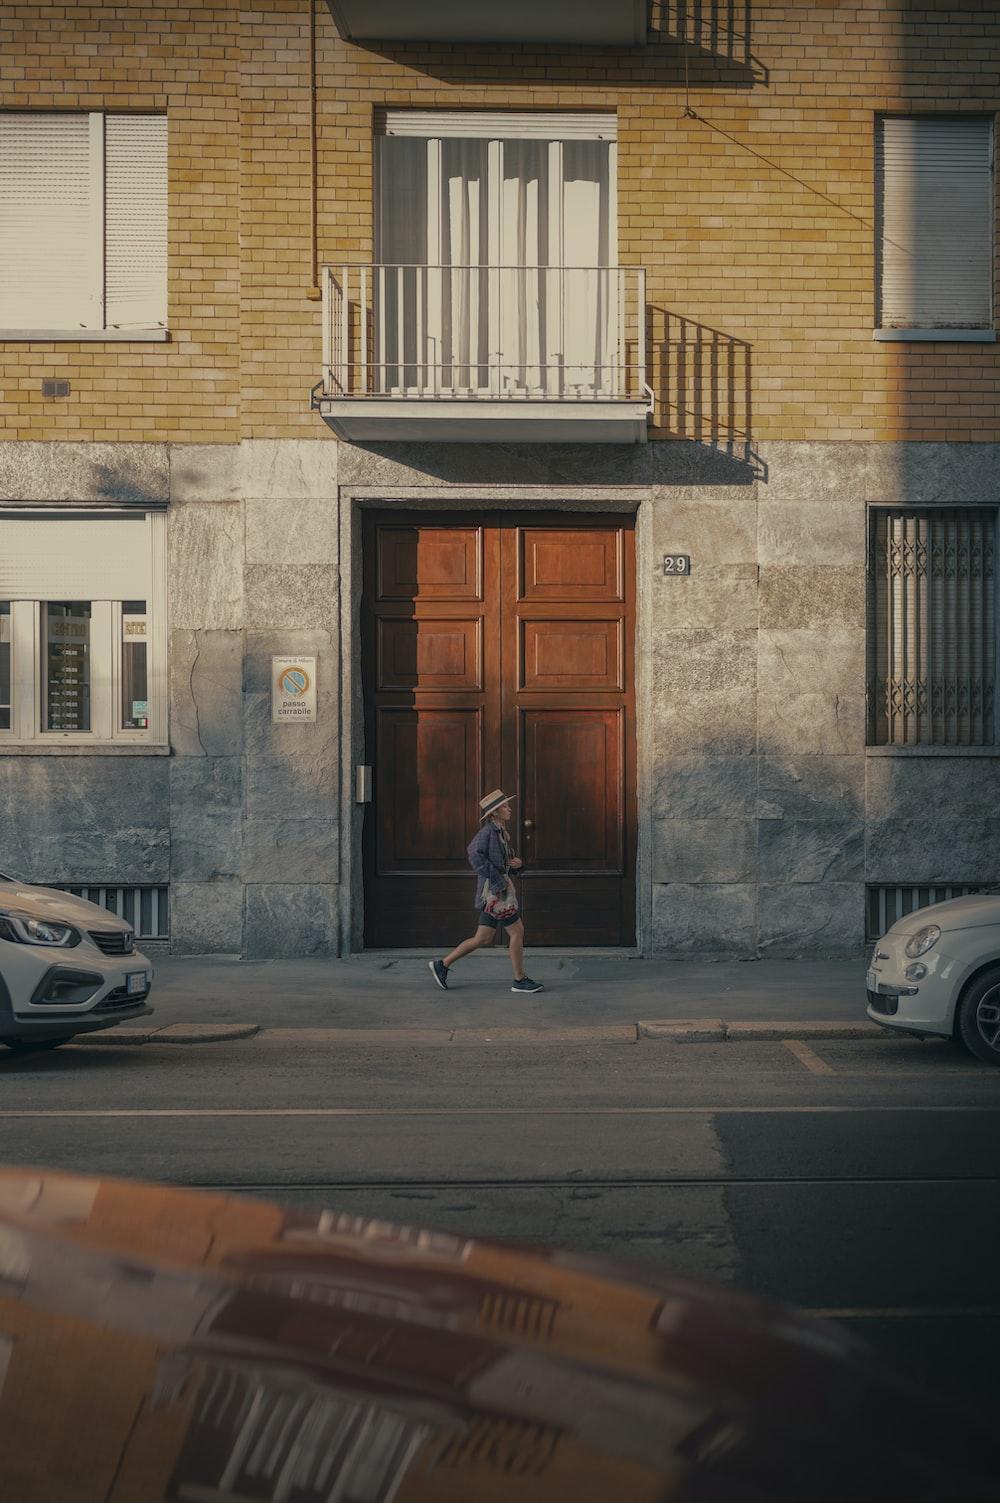 woman in red dress walking on sidewalk near brown wooden door during daytime